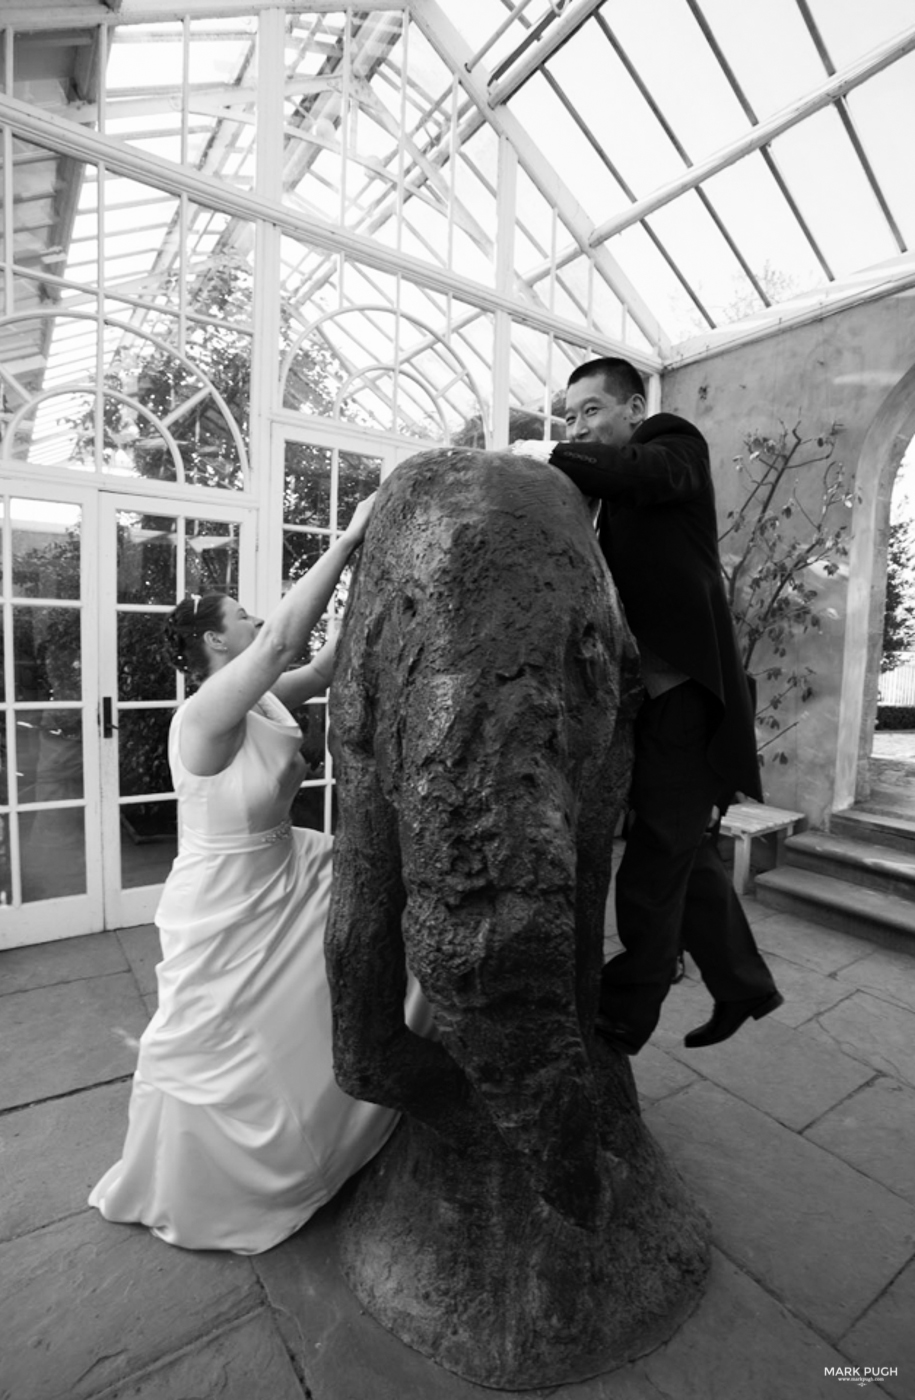 113  - Helen and Tim - Wedding Photography at Chatsworth House Bakewell Derbyshire DE45 1PP - Wedding Photographer Mark Pugh www.markpugh.com -172.JPG